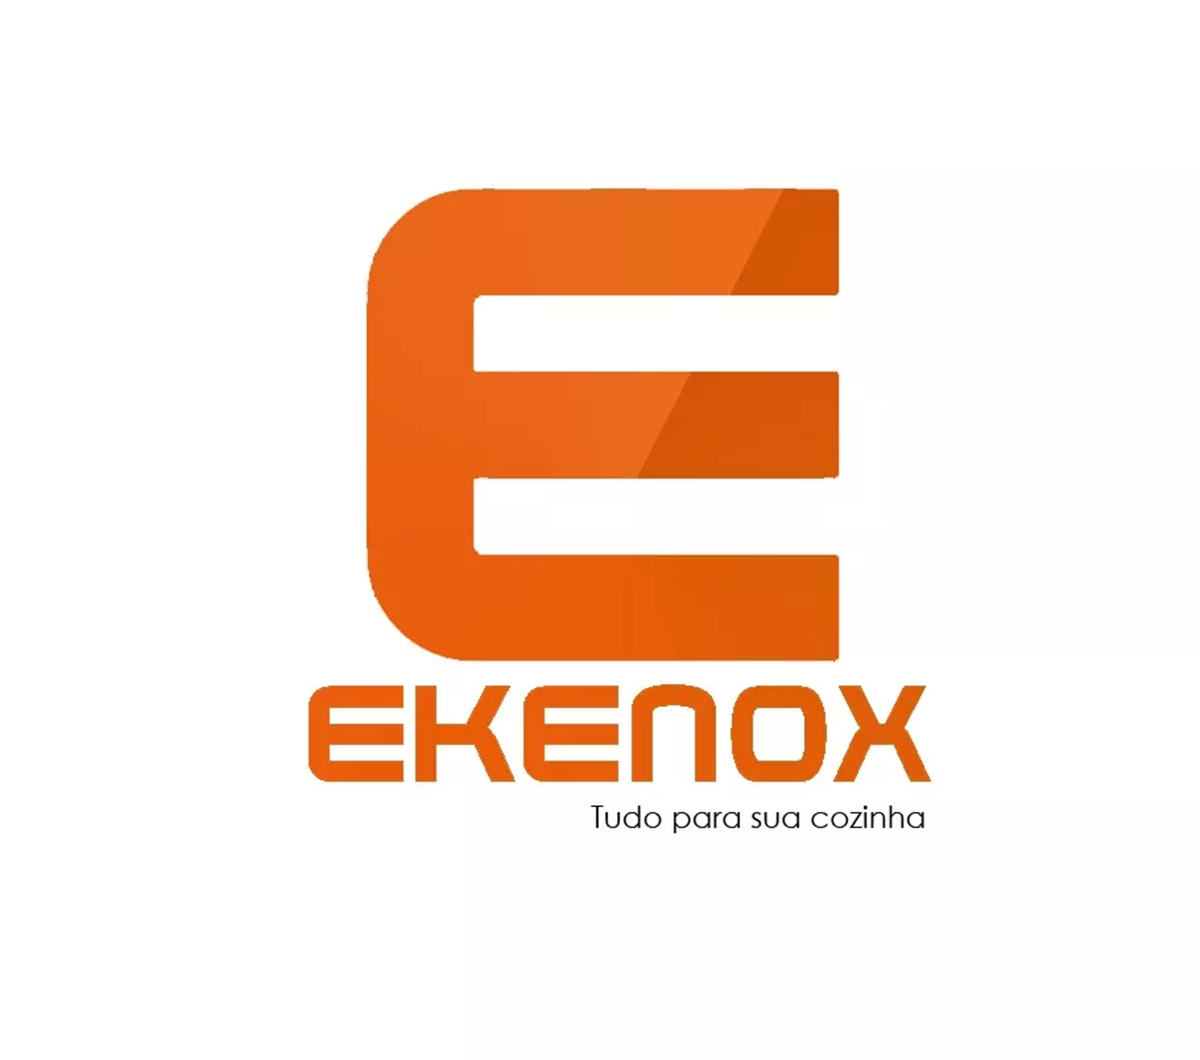 Kit 20 Porta Guardanapos  - EKENOX- Equipamentos Industriais